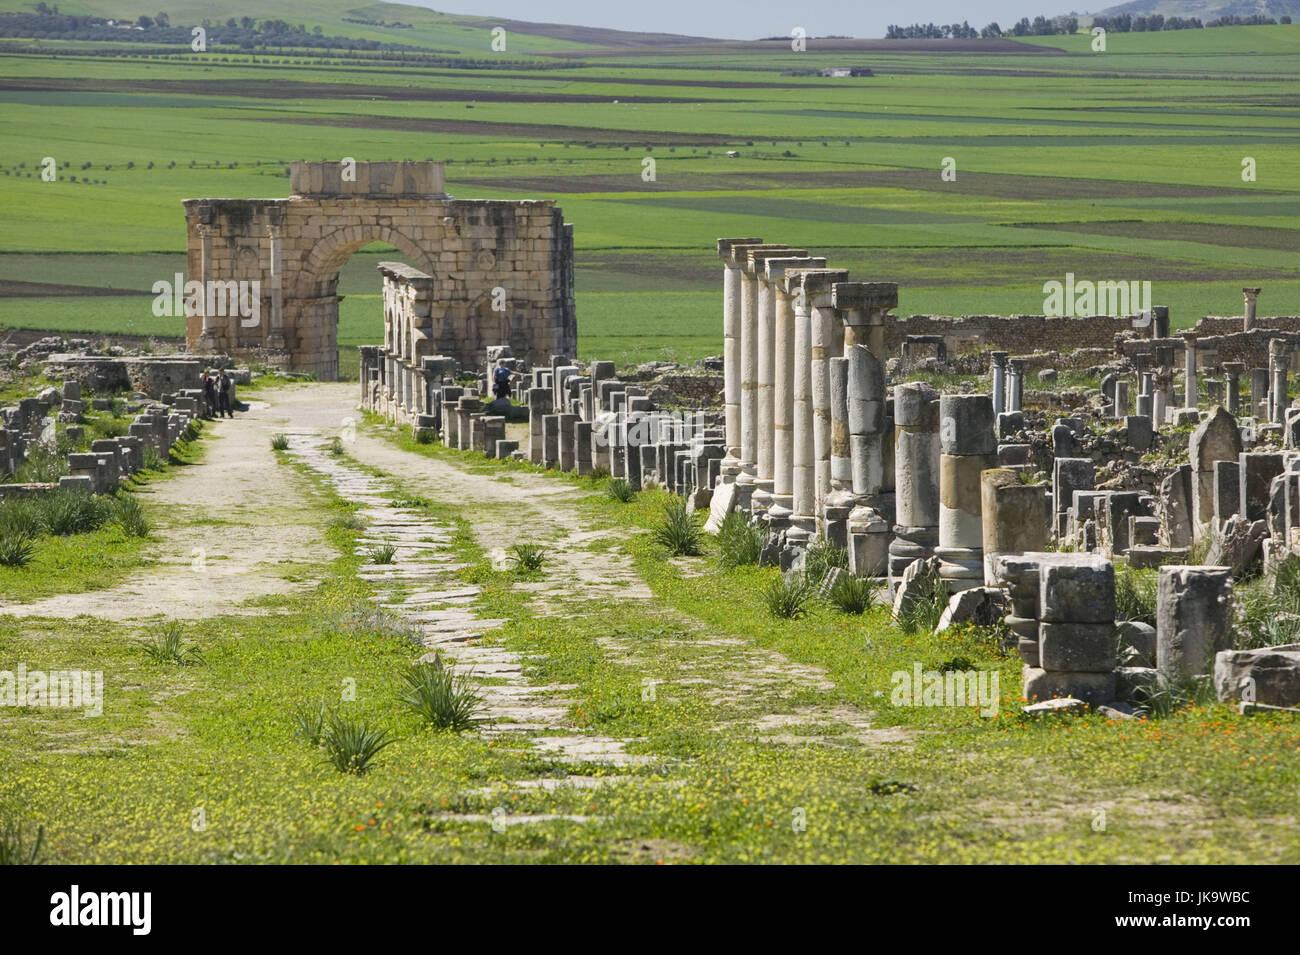 Marokko, Volubilis, Ruinen, Säulen,  Triumphbogen,   Reiseziel, Sehenswürdigkeit, Kultur, Ruinenfeld, - Stock Image